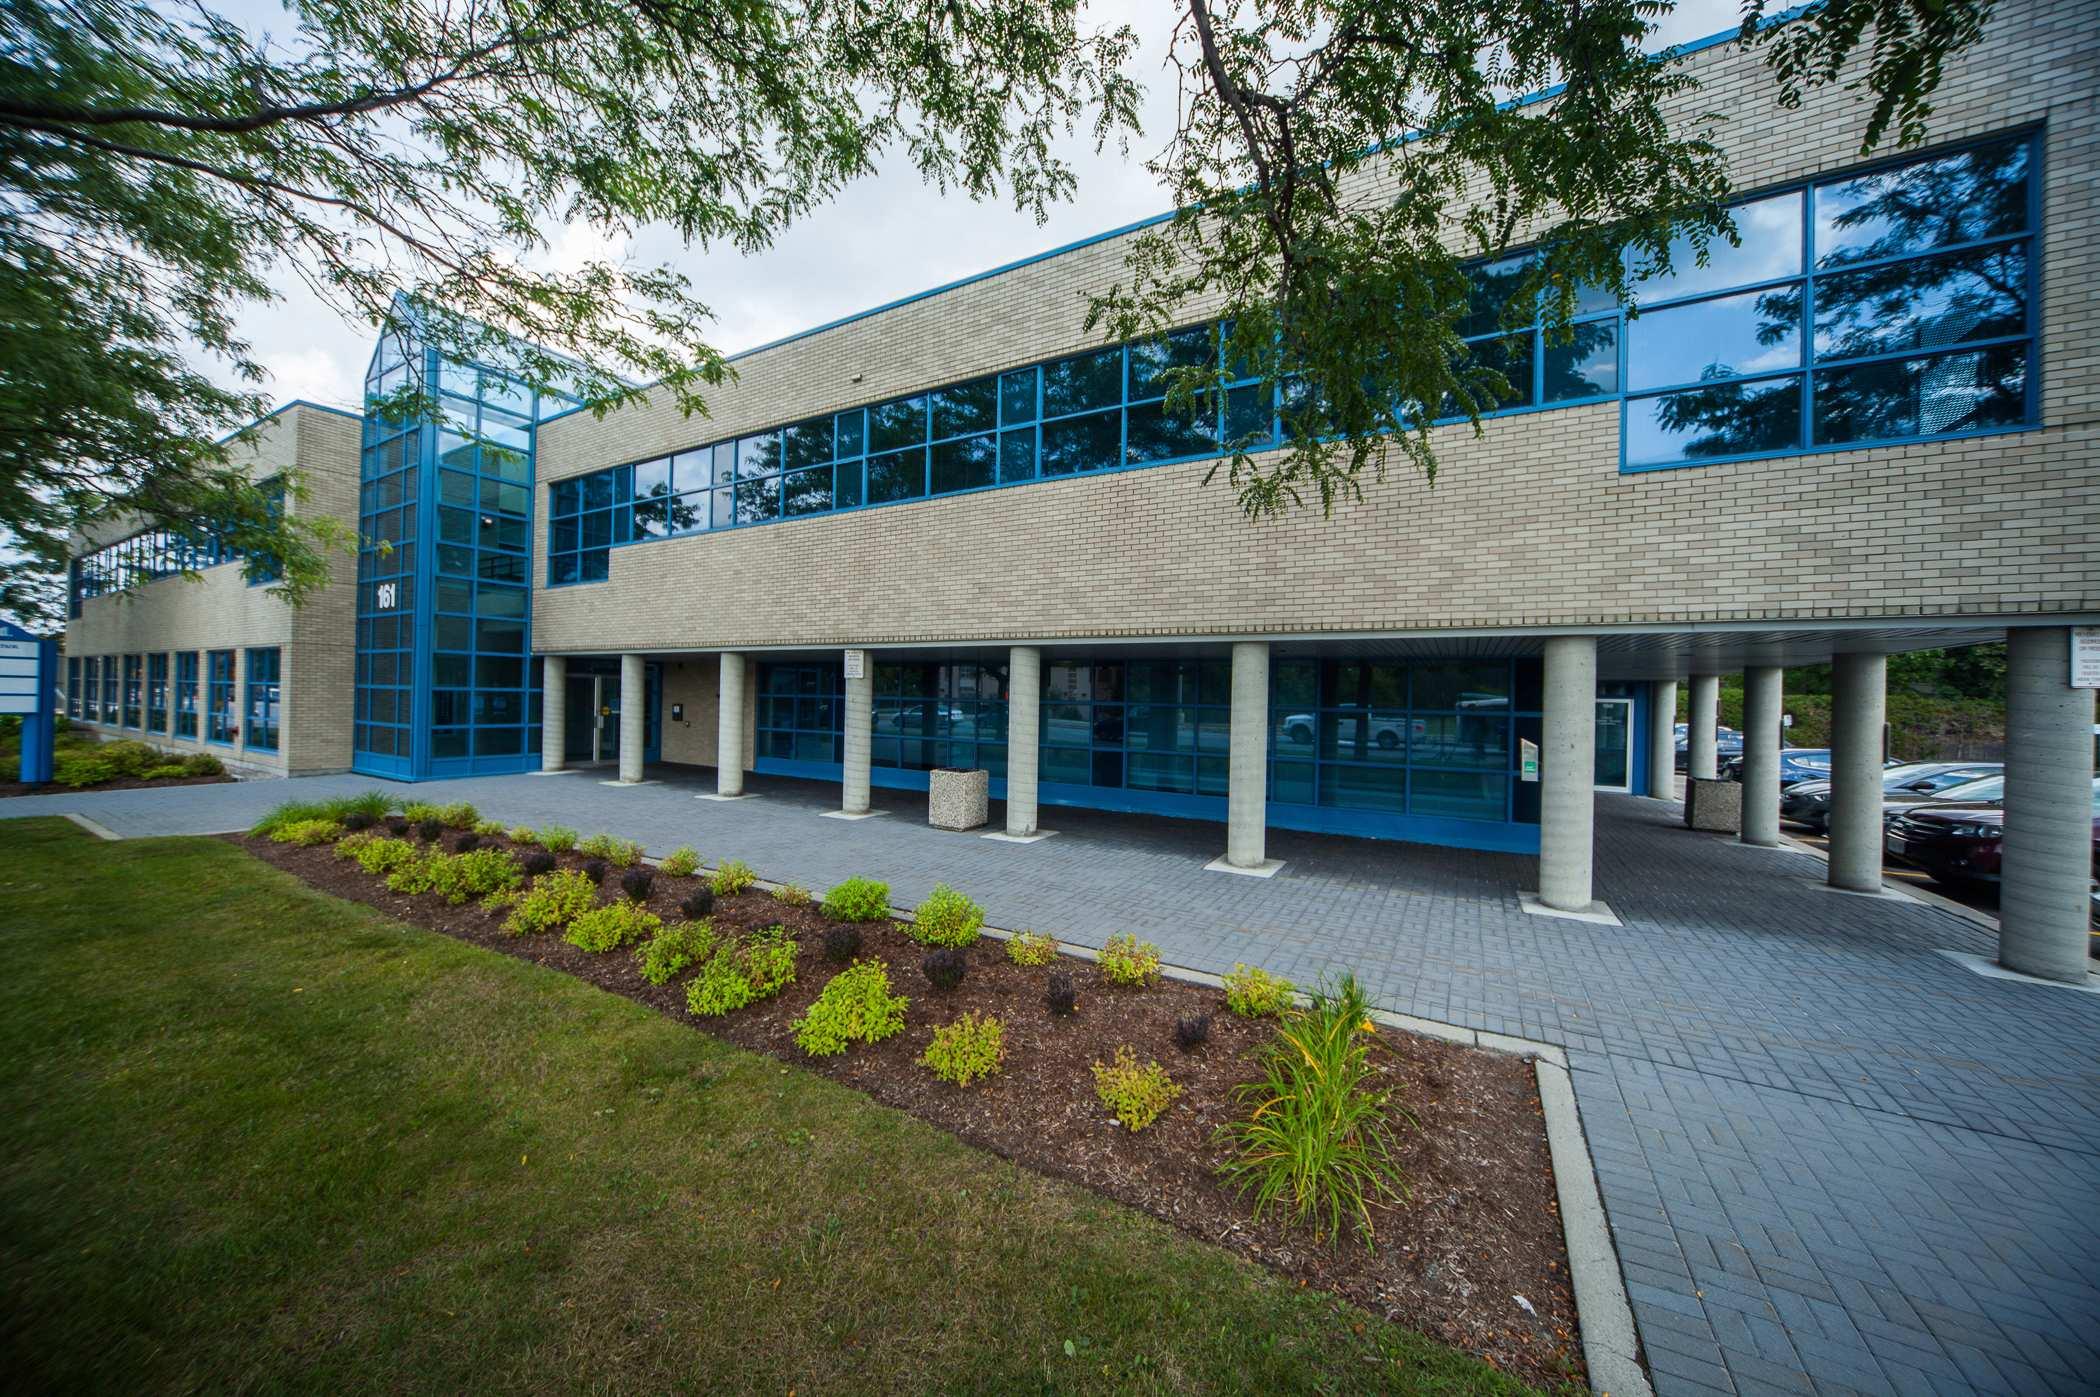 161 Greenbank Road, Nepean, Ontario